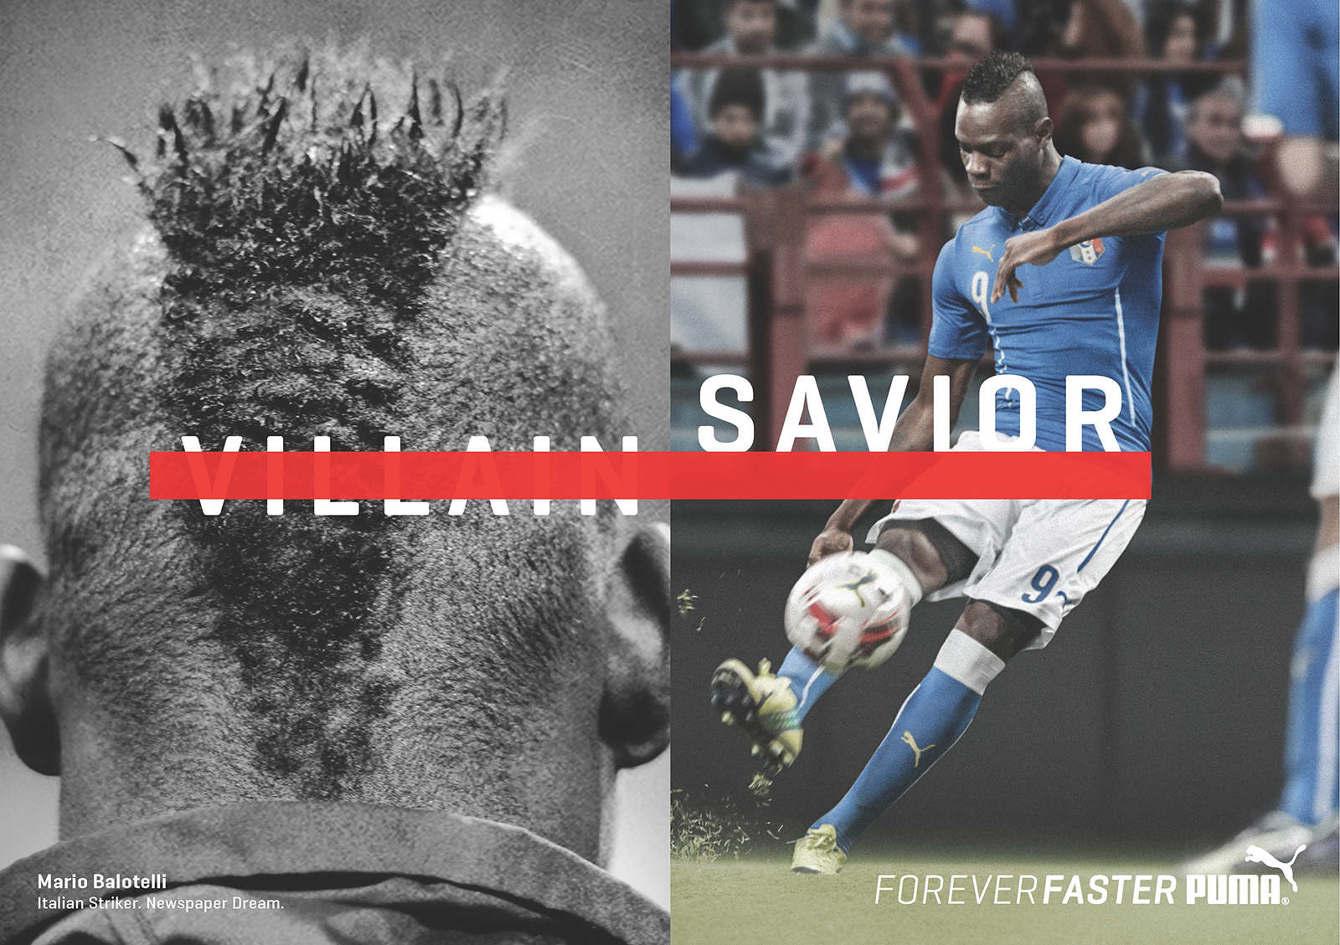 Balotelli-Villan-Savior_1600_c_1340_c.jpg